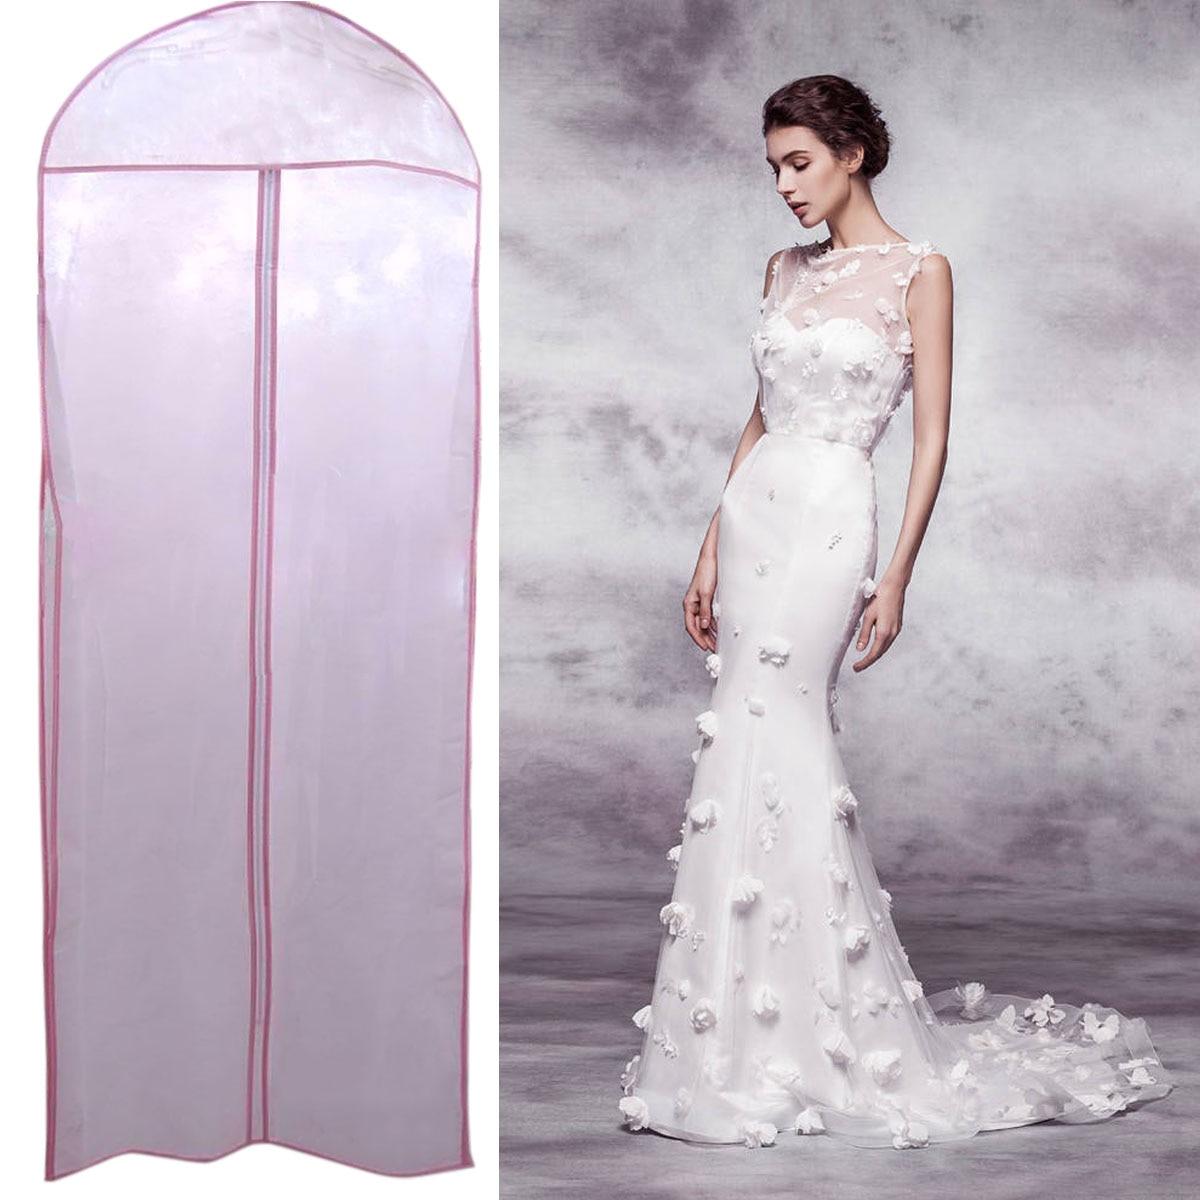 180 X 58 X 8cm Women Bridal Wedding Dress Gown Robe